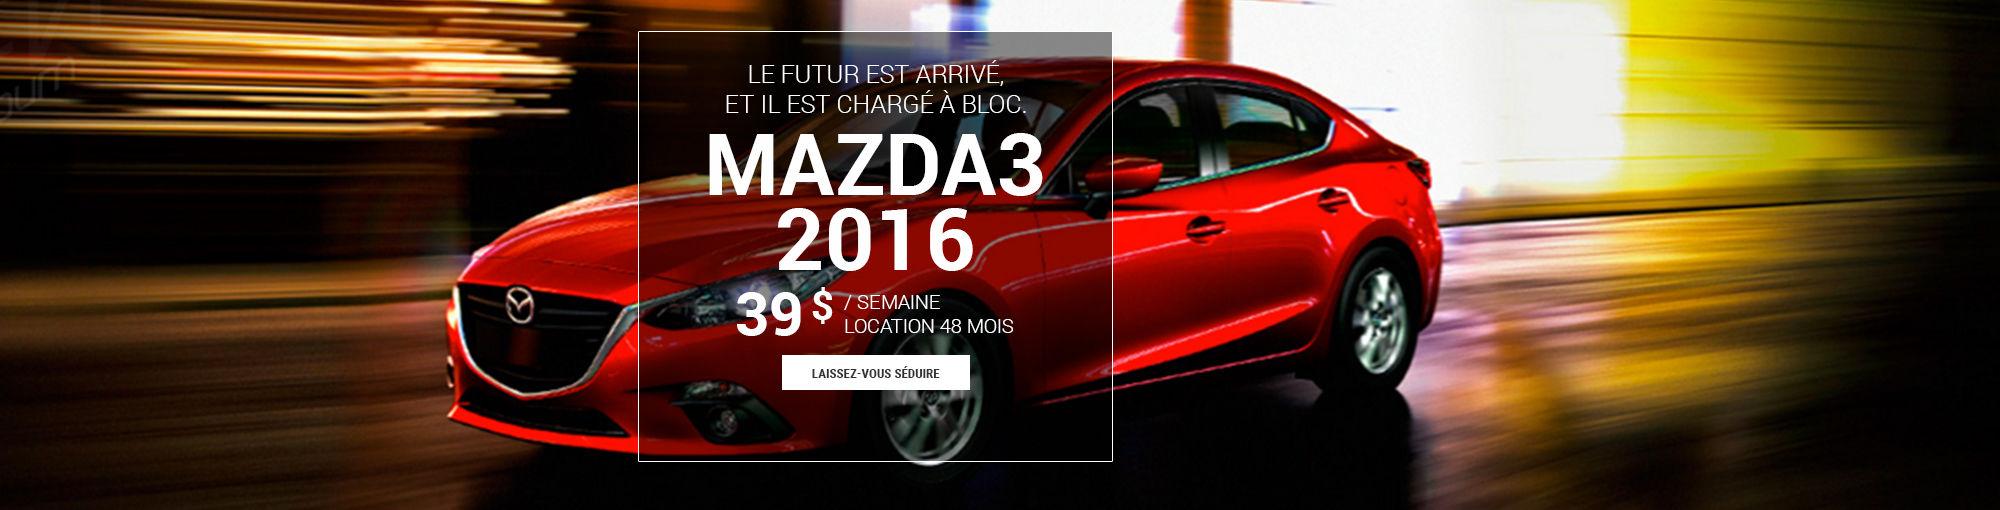 Mazda3 2016 -août 2016